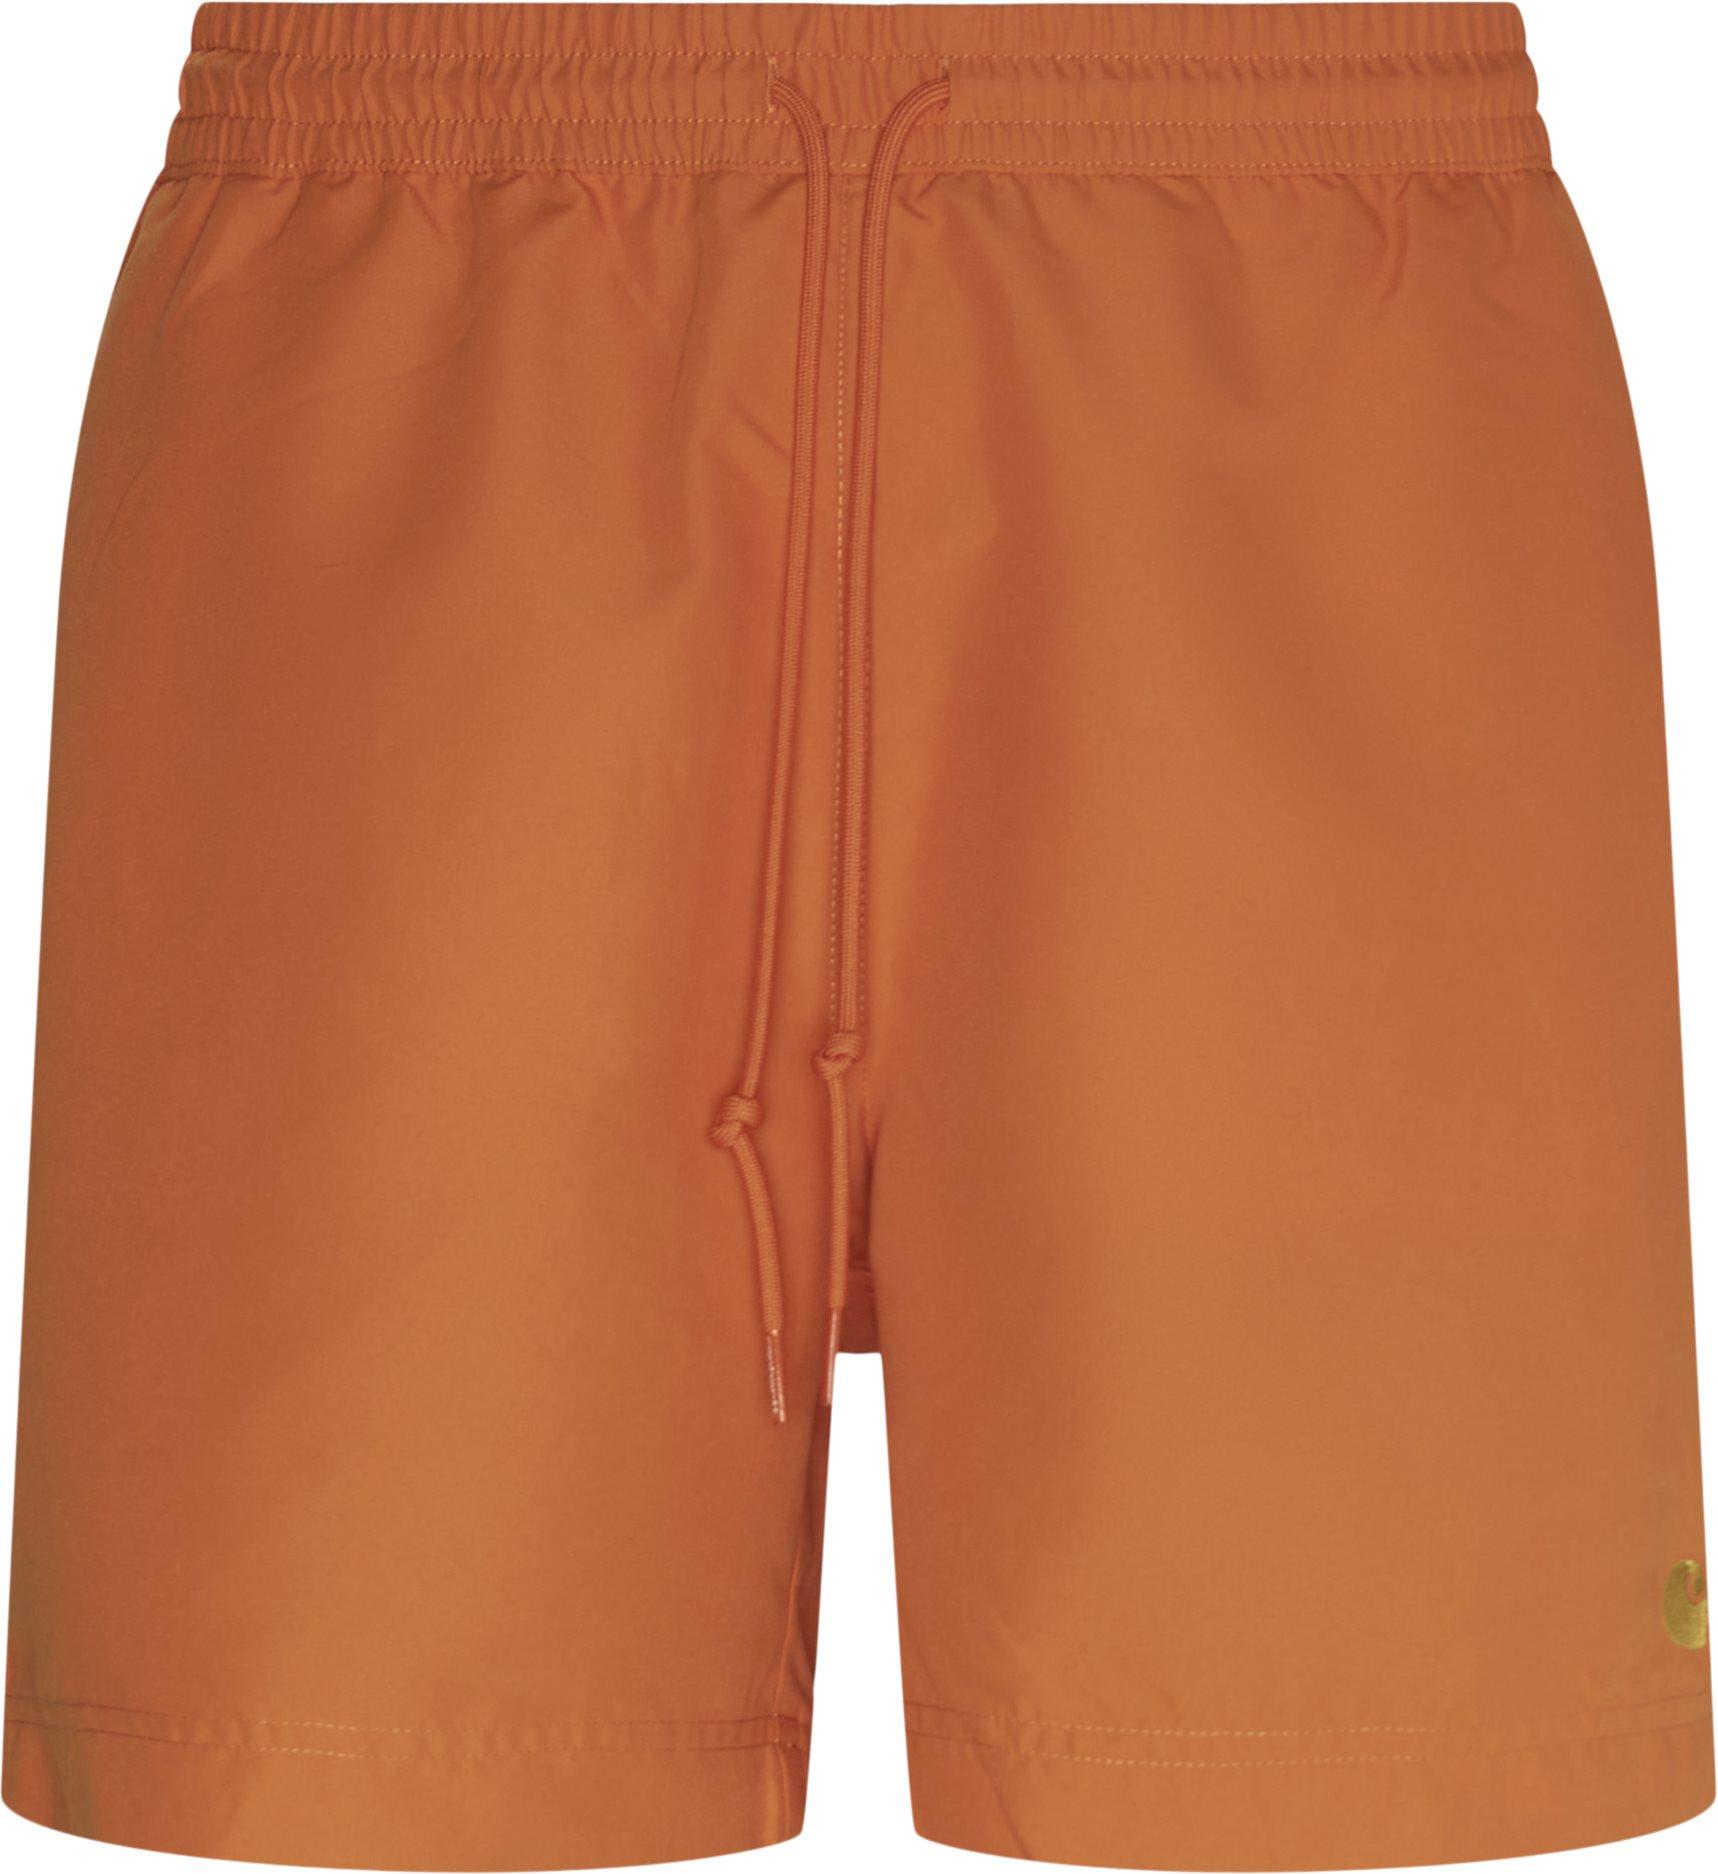 Shorts - Regular fit - Orange